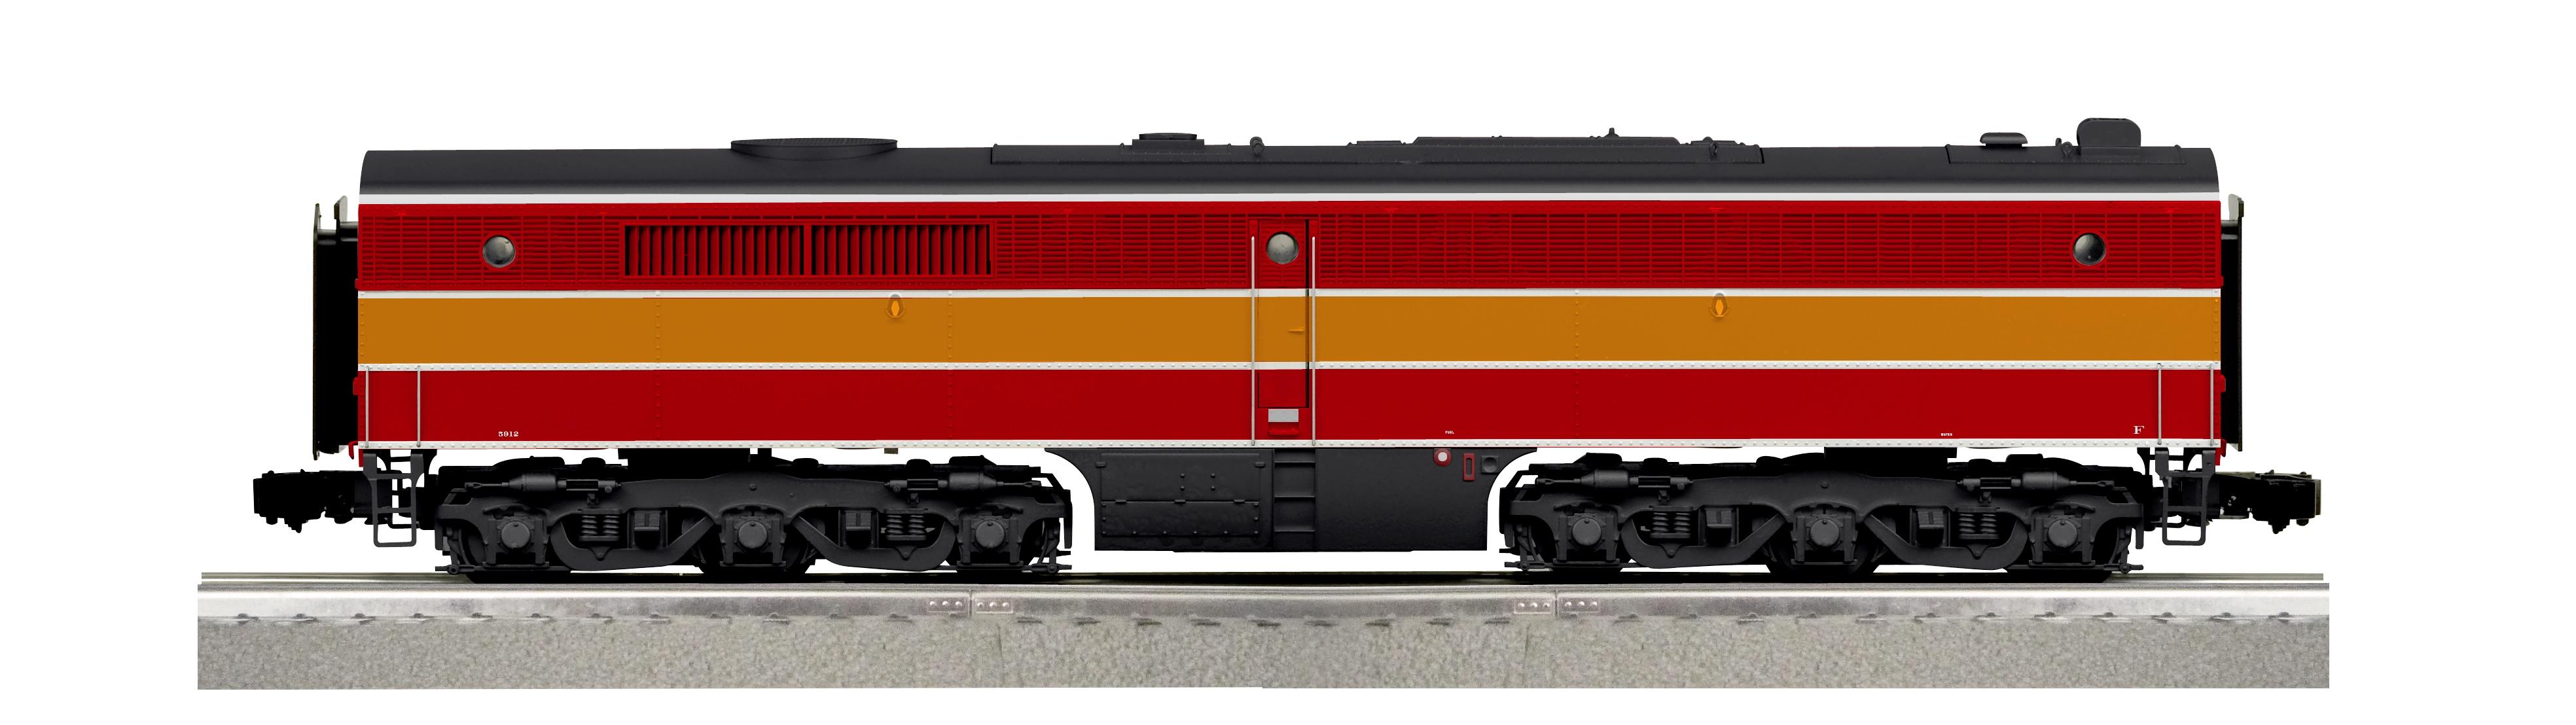 American Flyer Parts Diagram Motor Auto Electrical Wiring Diagrams Lionel Train Engine Marx Odicis Trains